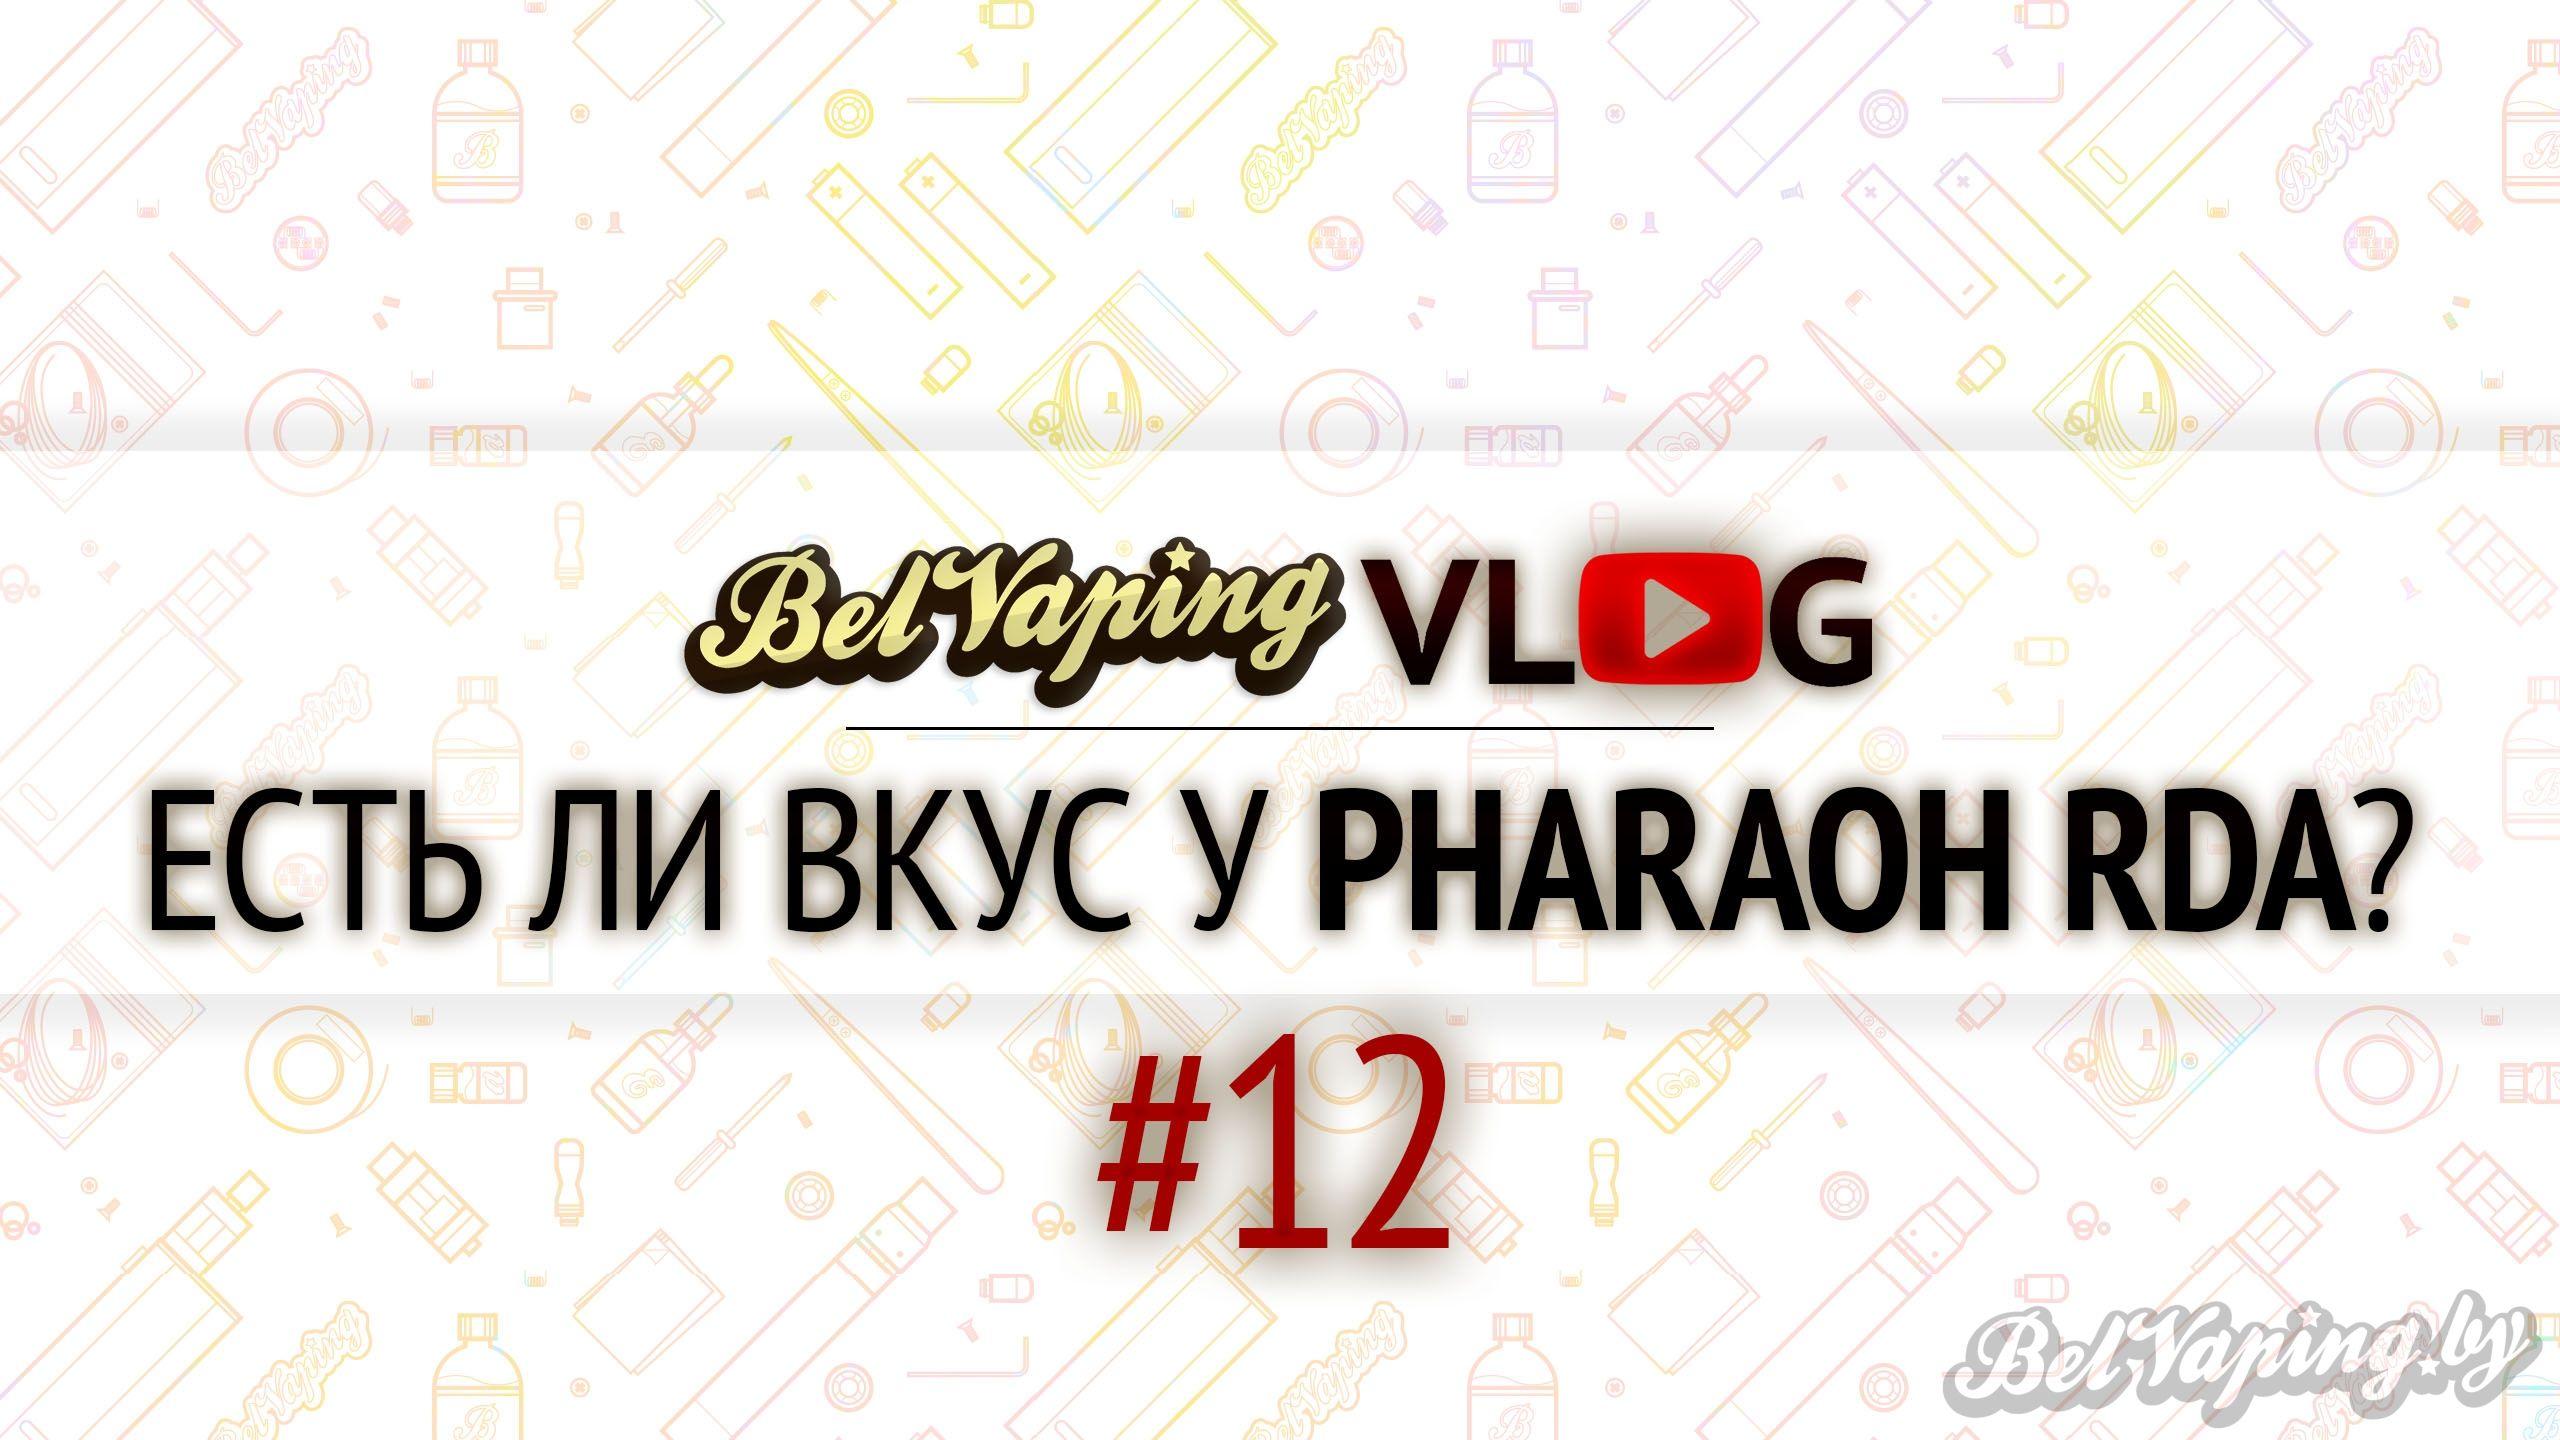 BelVapingVlog #12: А есть ли вкус у Pharaoh RDA?